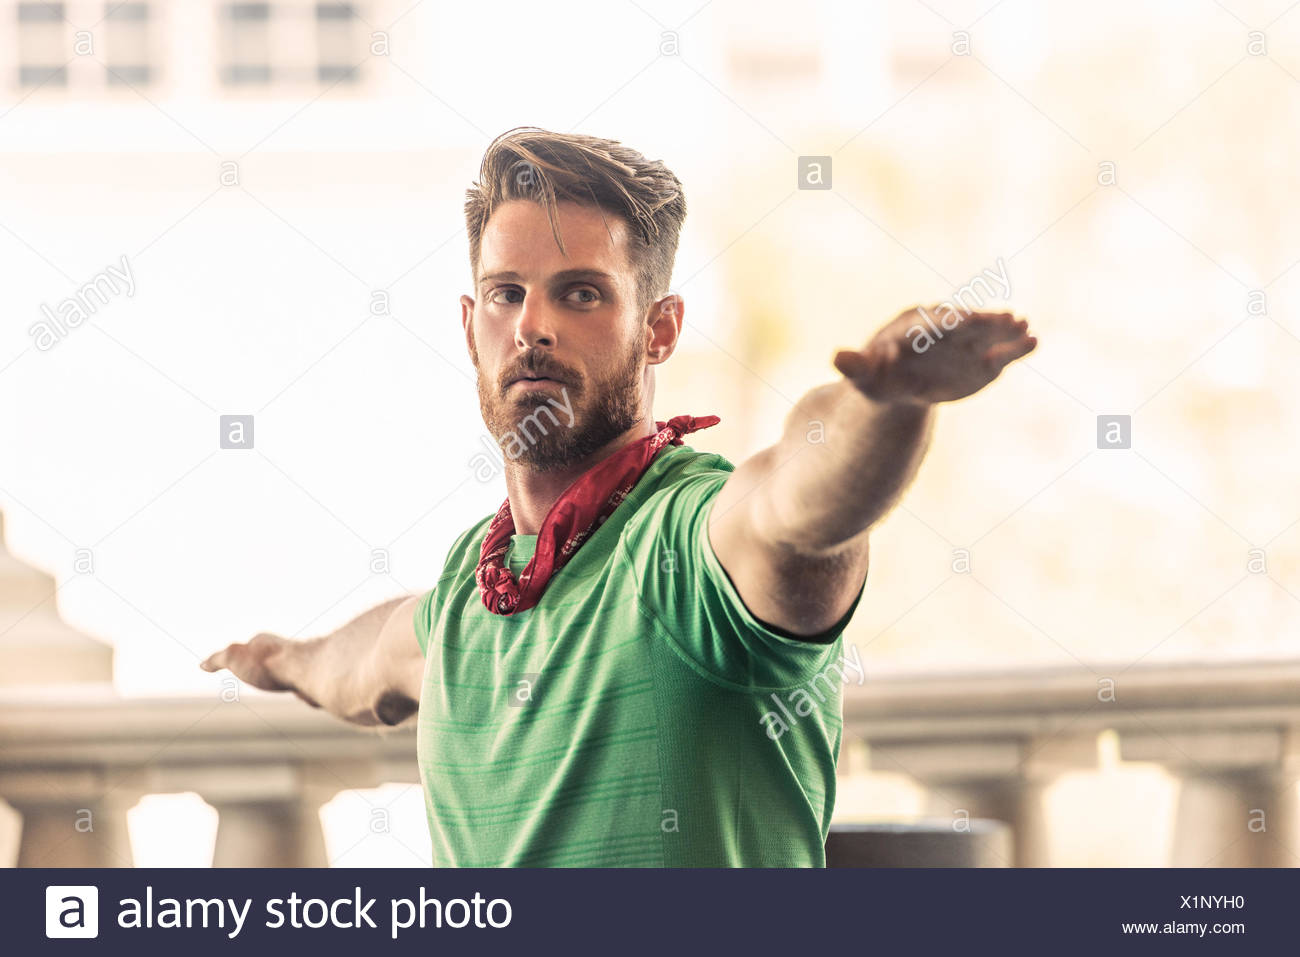 Adulto joven hombre en posición de yoga Imagen De Stock